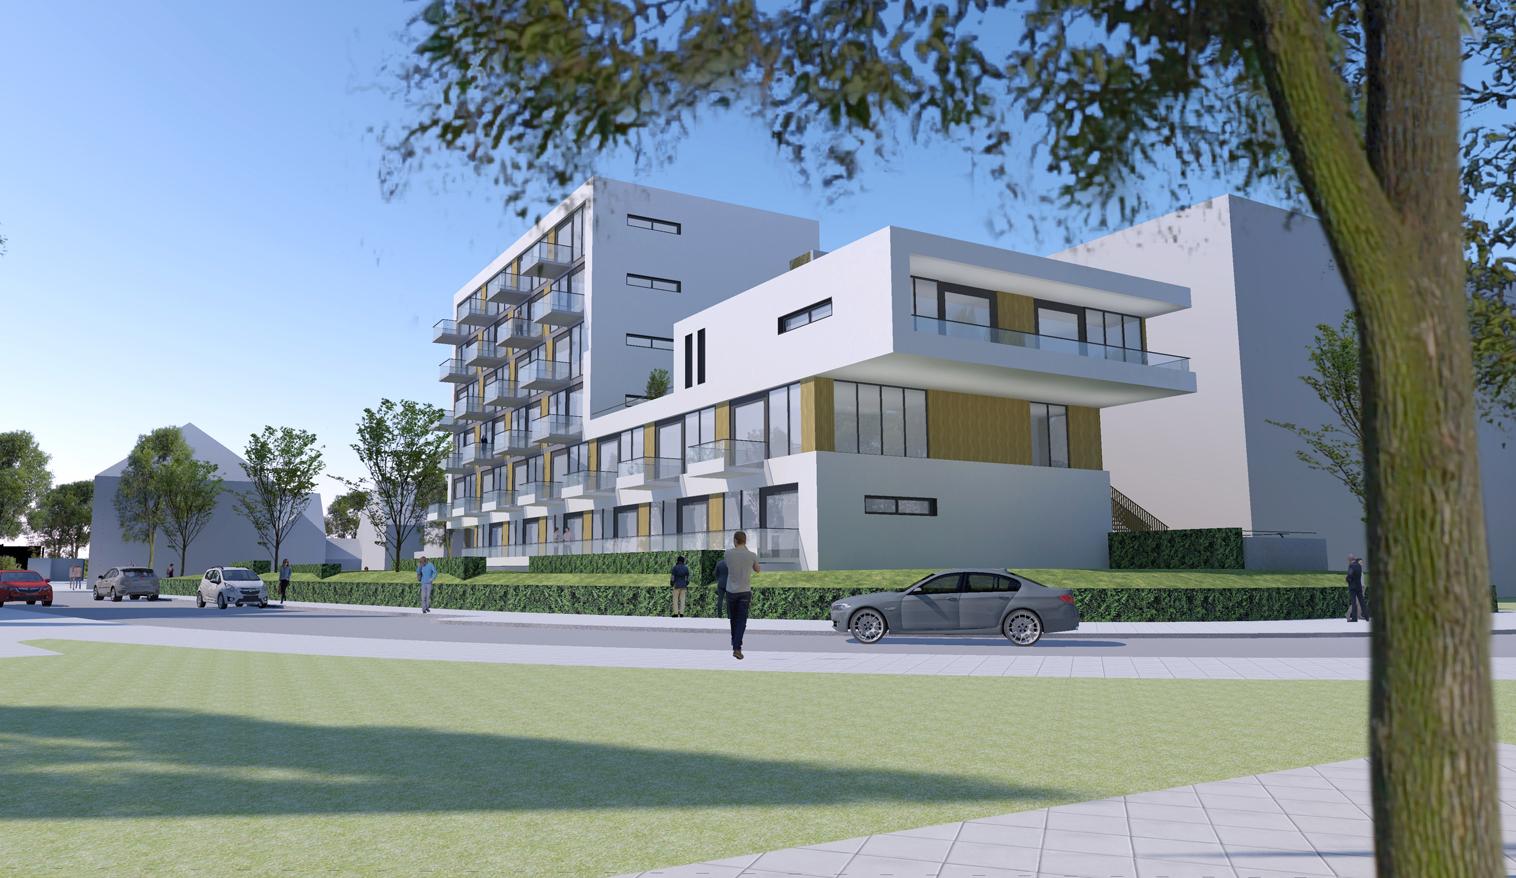 05 OPL Architecten_Ravellaan Utrecht-1516×878-72dpi